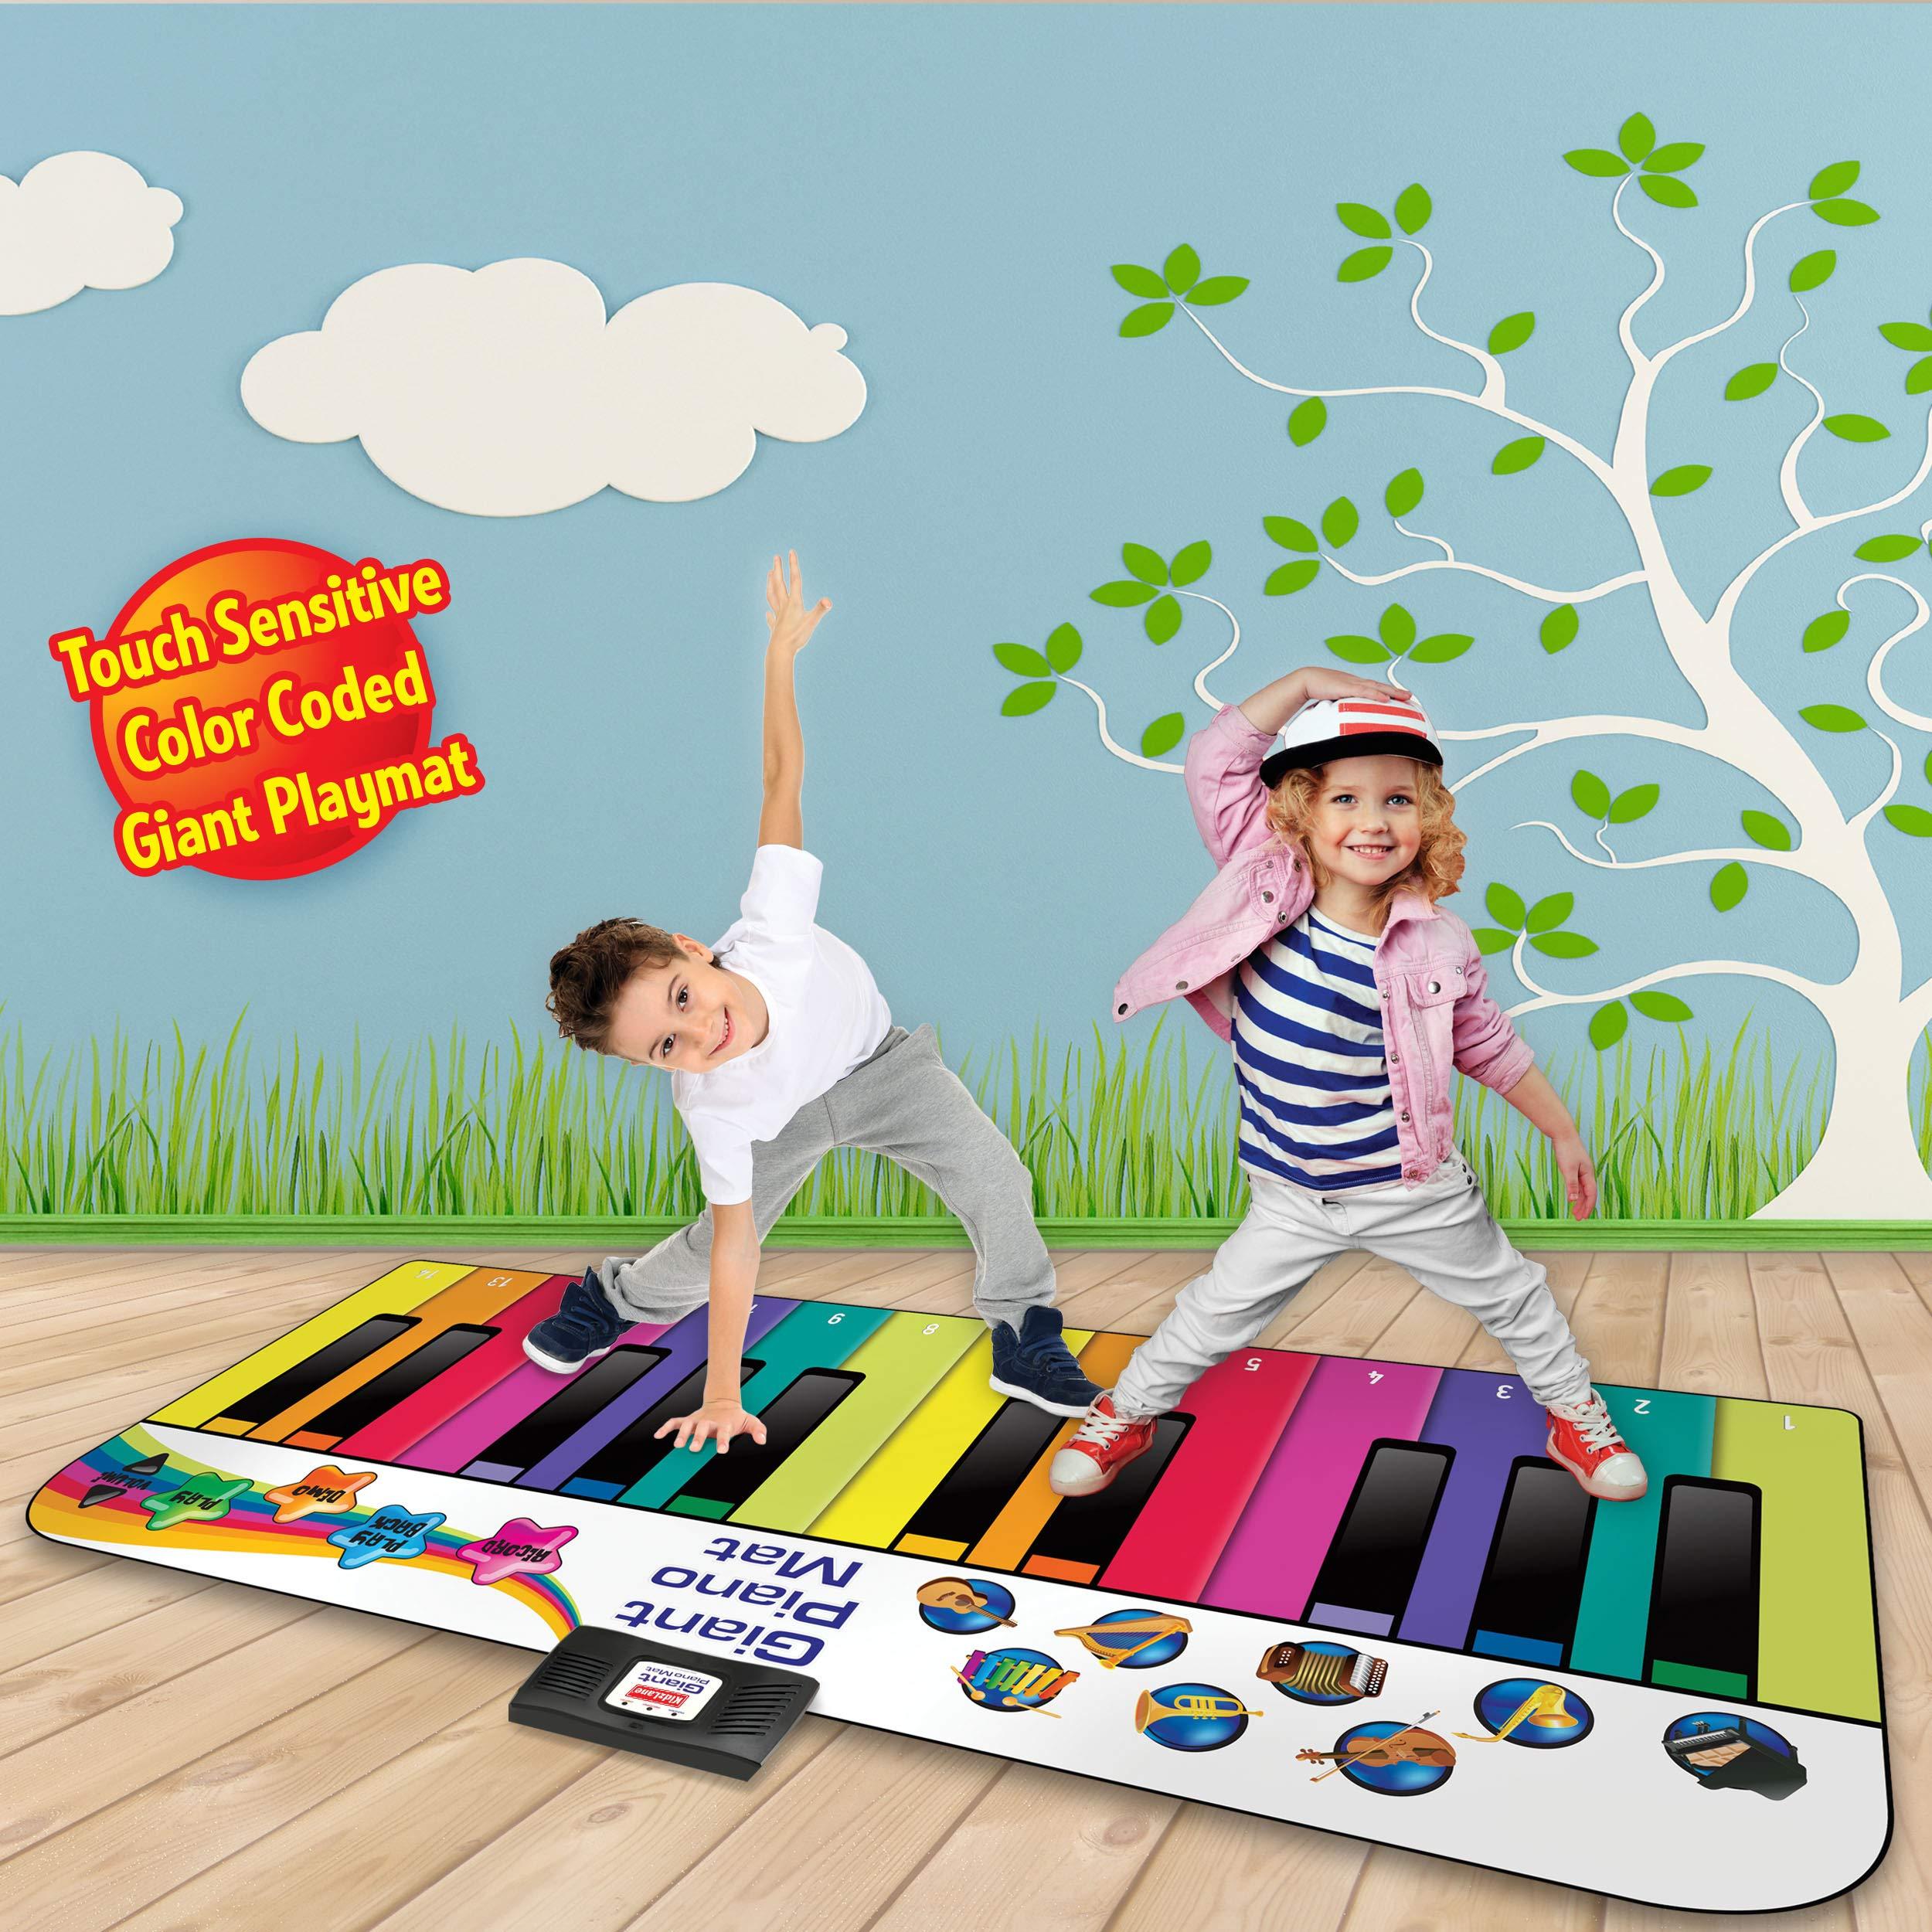 Kidzlane Floor Piano Mat: Jumbo 6 Foot Musical Keyboard Playmat for Toddlers and Kids by Kidzlane (Image #2)